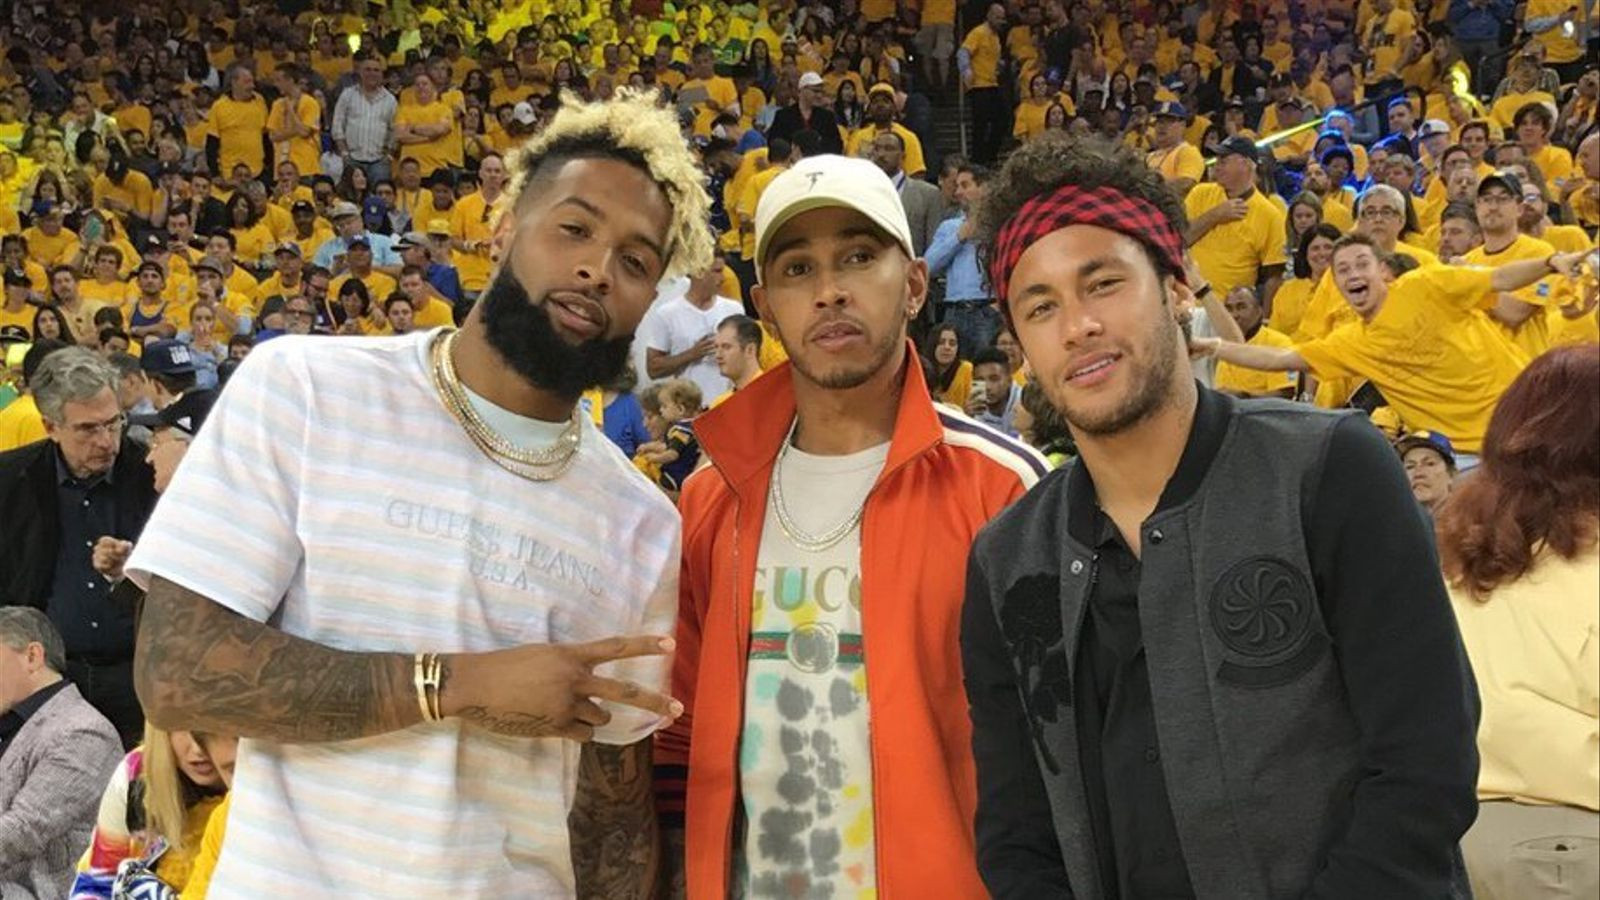 ¿Cuánto mide Lewis Hamilton? - Estatura y peso - Real height Odell-Beckham-Lewis-Hamilton-Neymar_1808829180_41318618_1000x1309